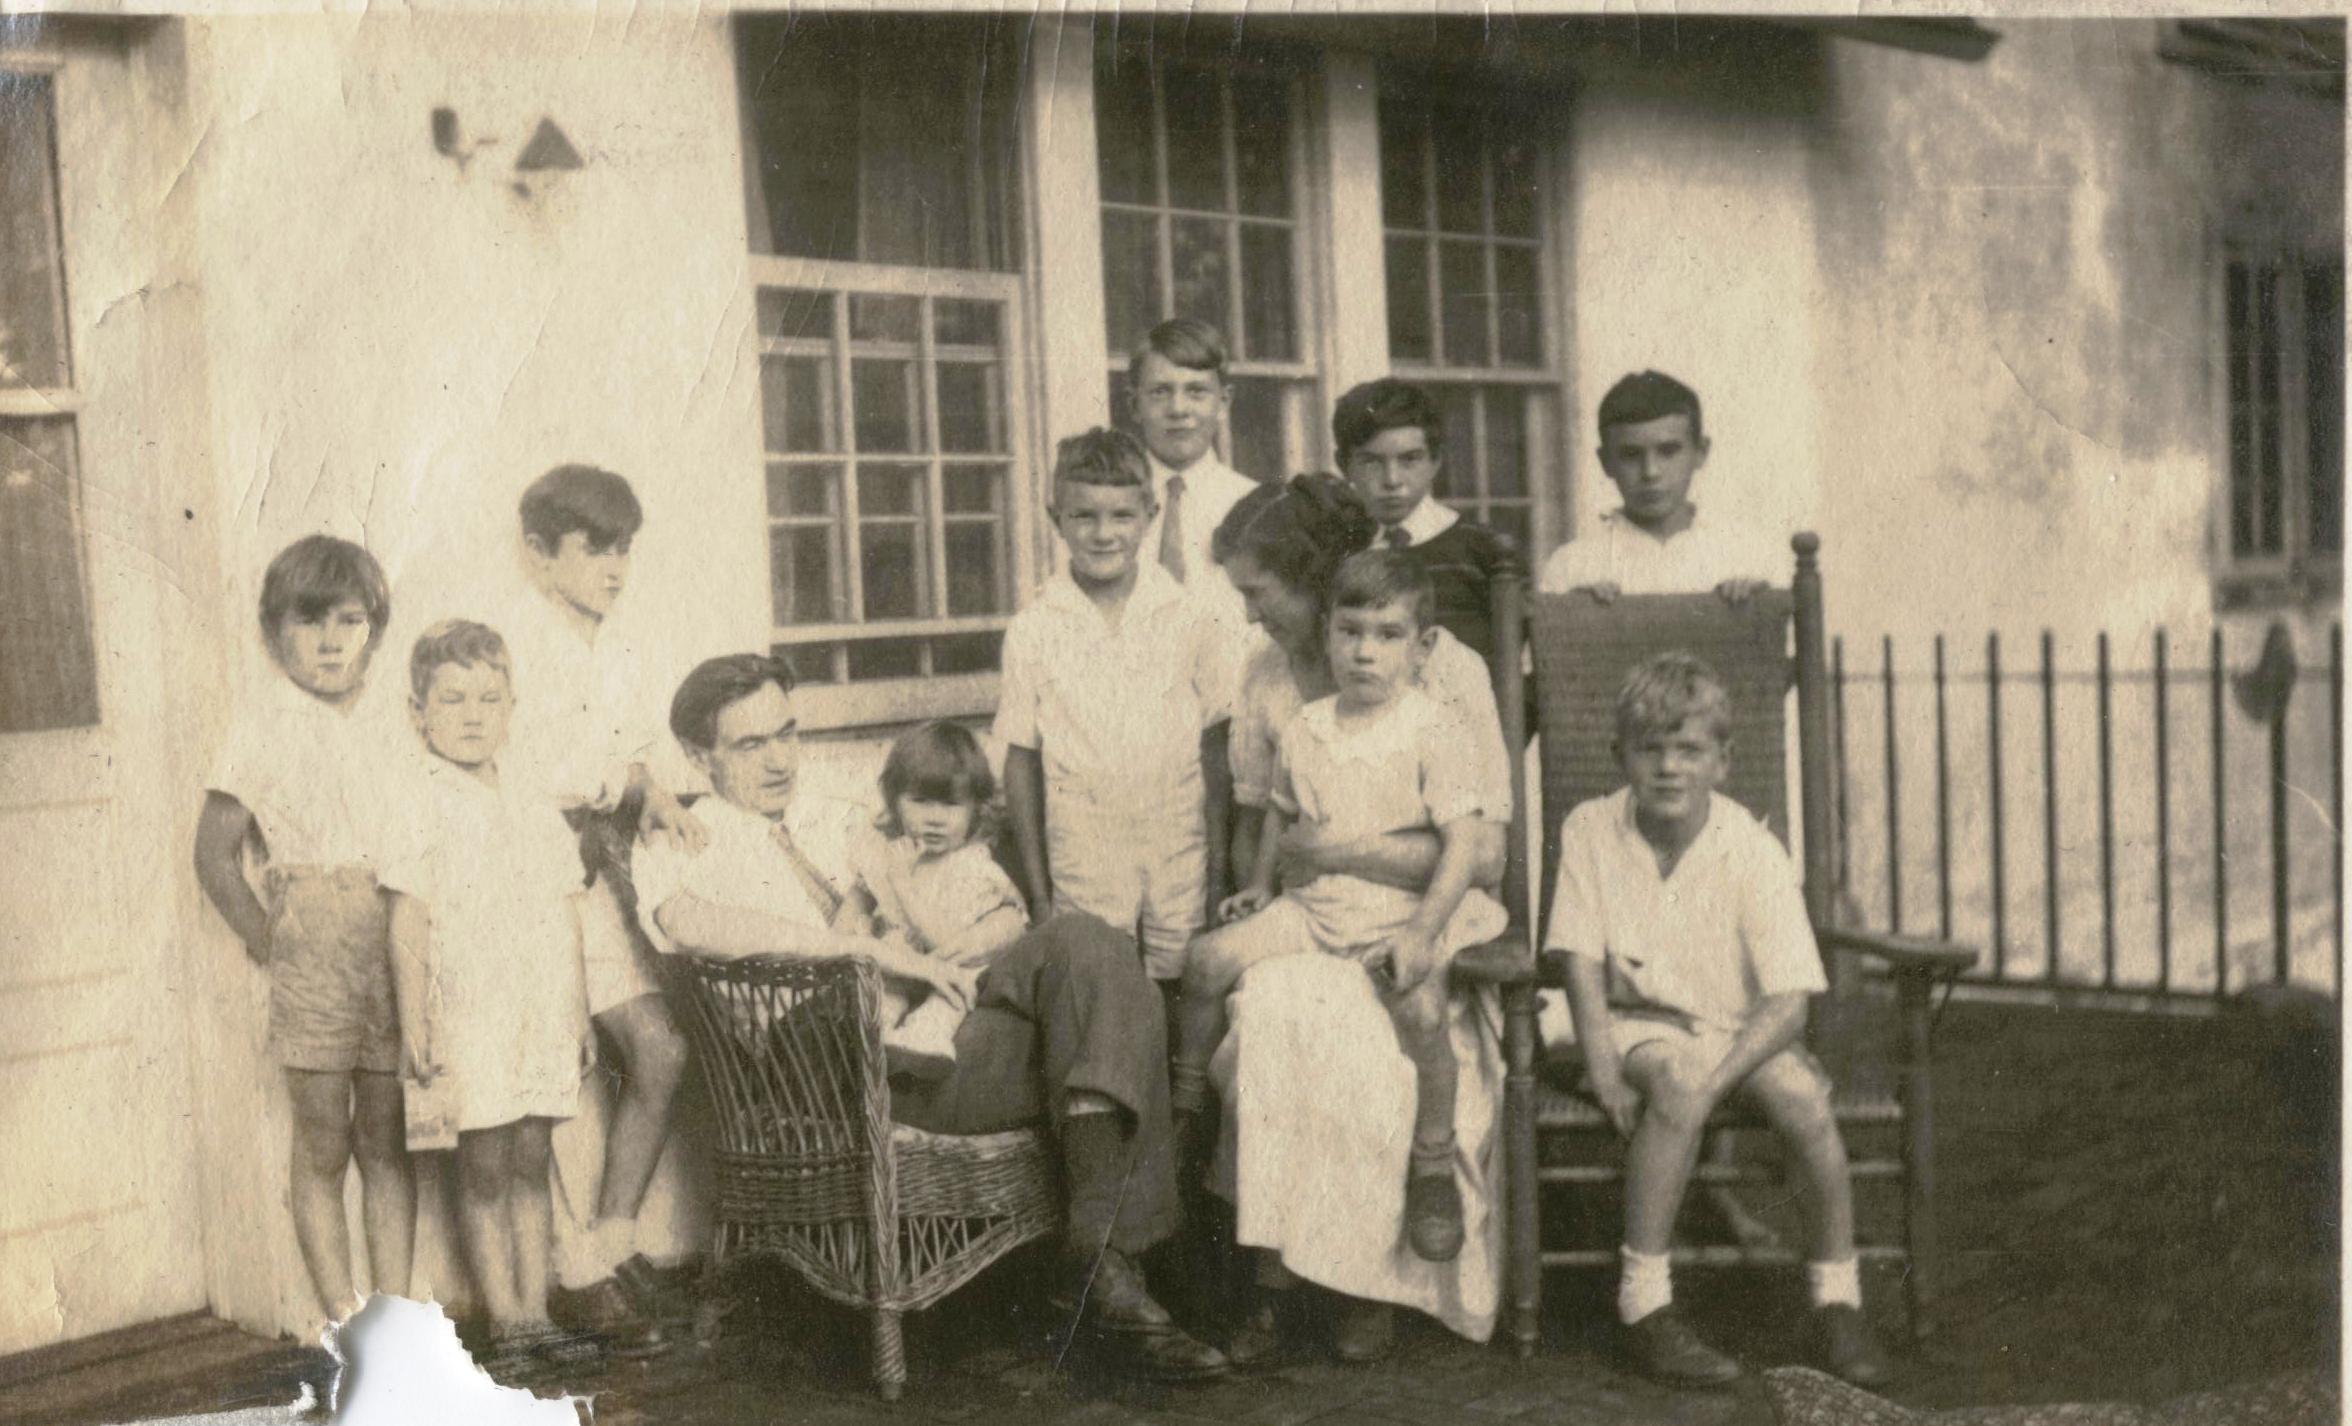 The Schmitt family on the porch, 1936